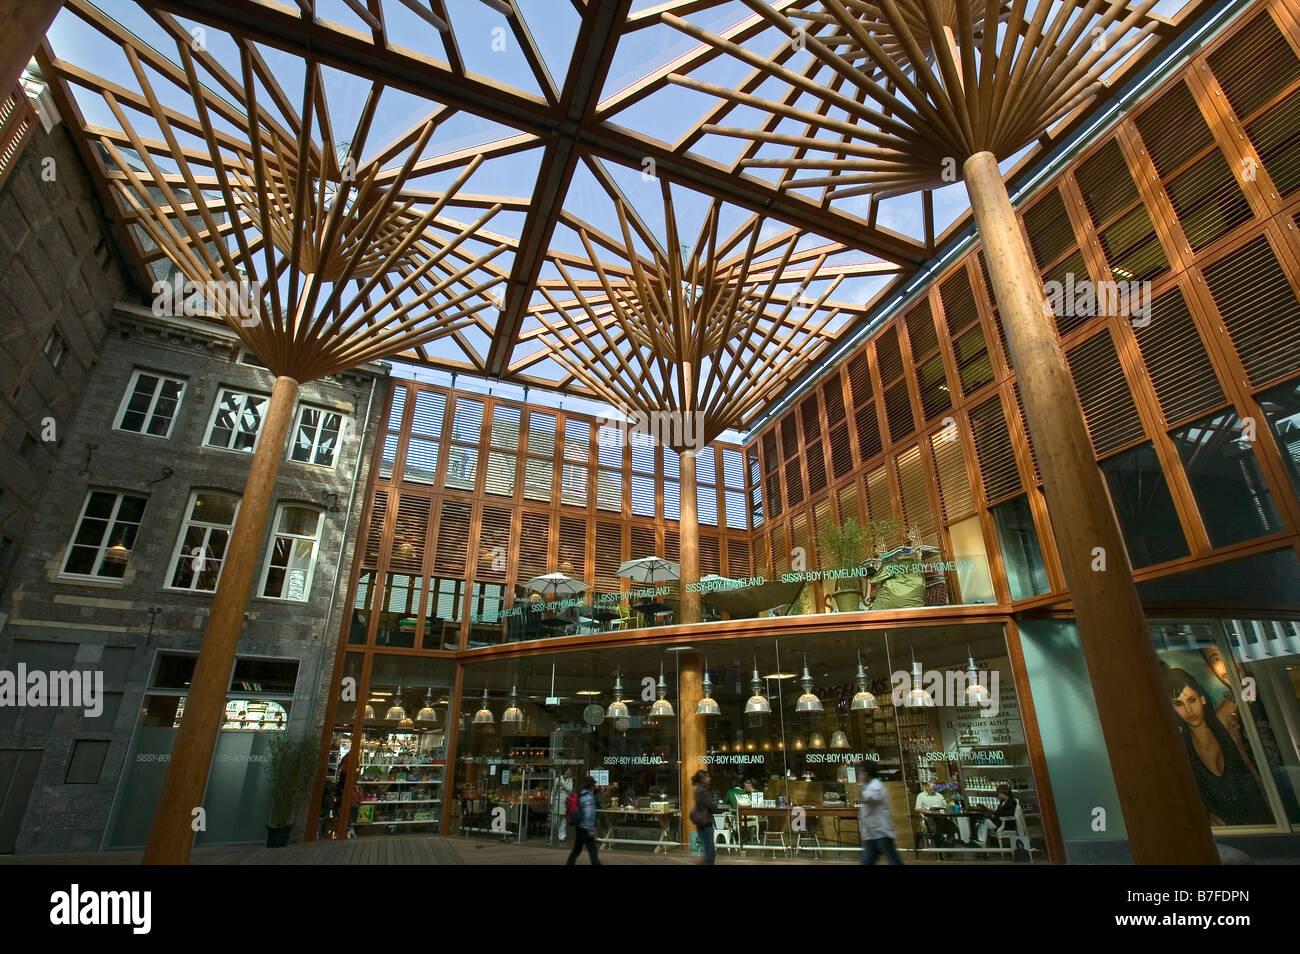 Shopping center in maastricht netherlands europe stock - Maastricht mobel ...